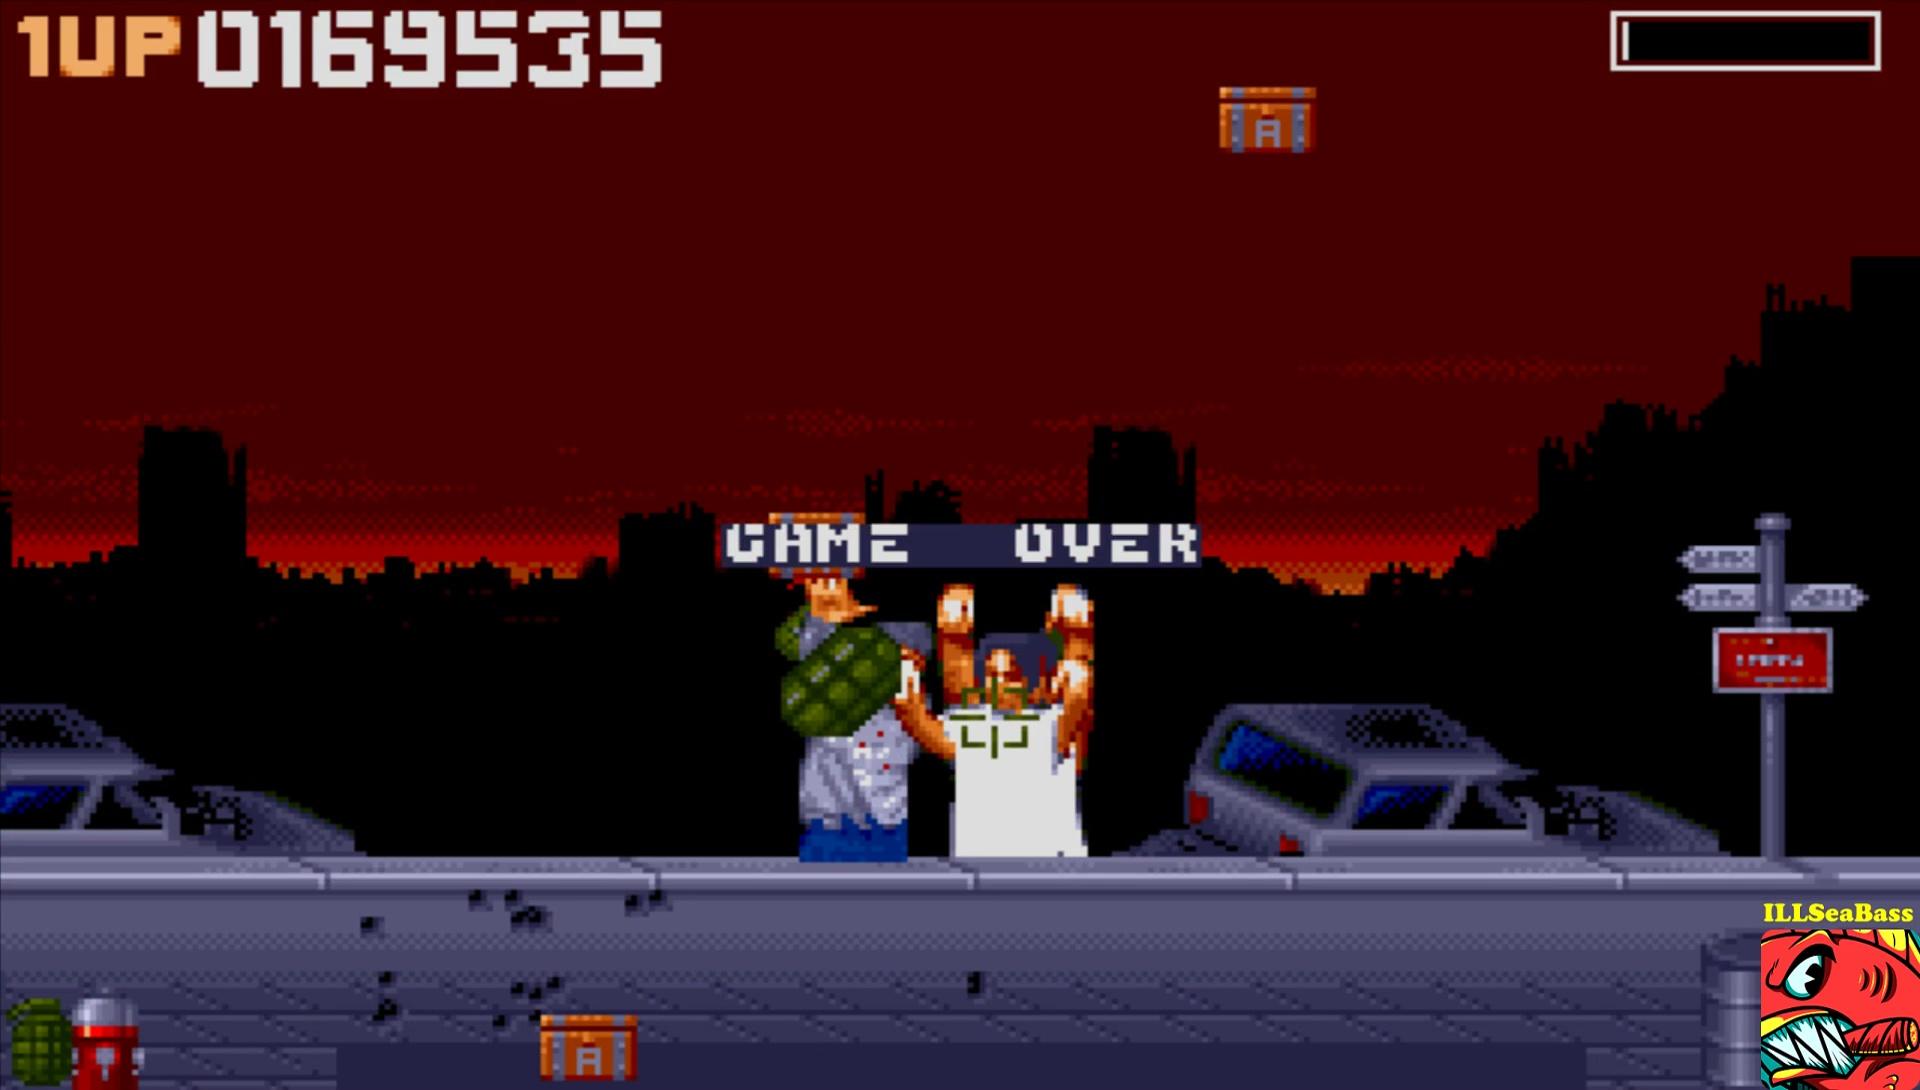 ILLSeaBass: Zombie Apocalypse (Amiga Emulated) 169,535 points on 2017-02-03 19:52:24